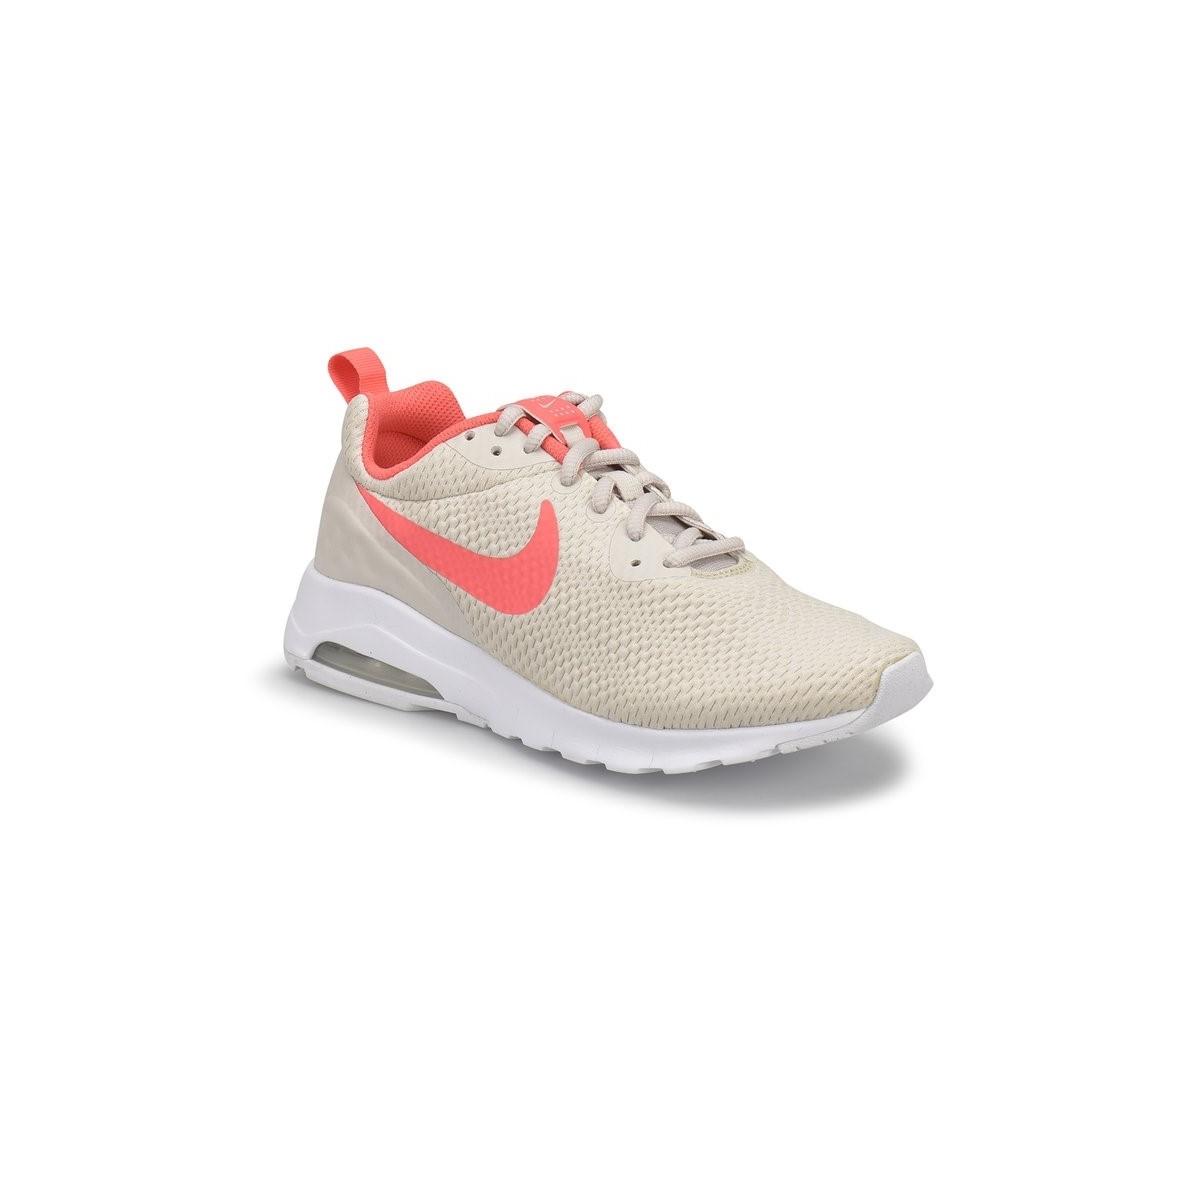 Air Max Motion Lw Kadın Koşu Ayakkabısı (833662-100)